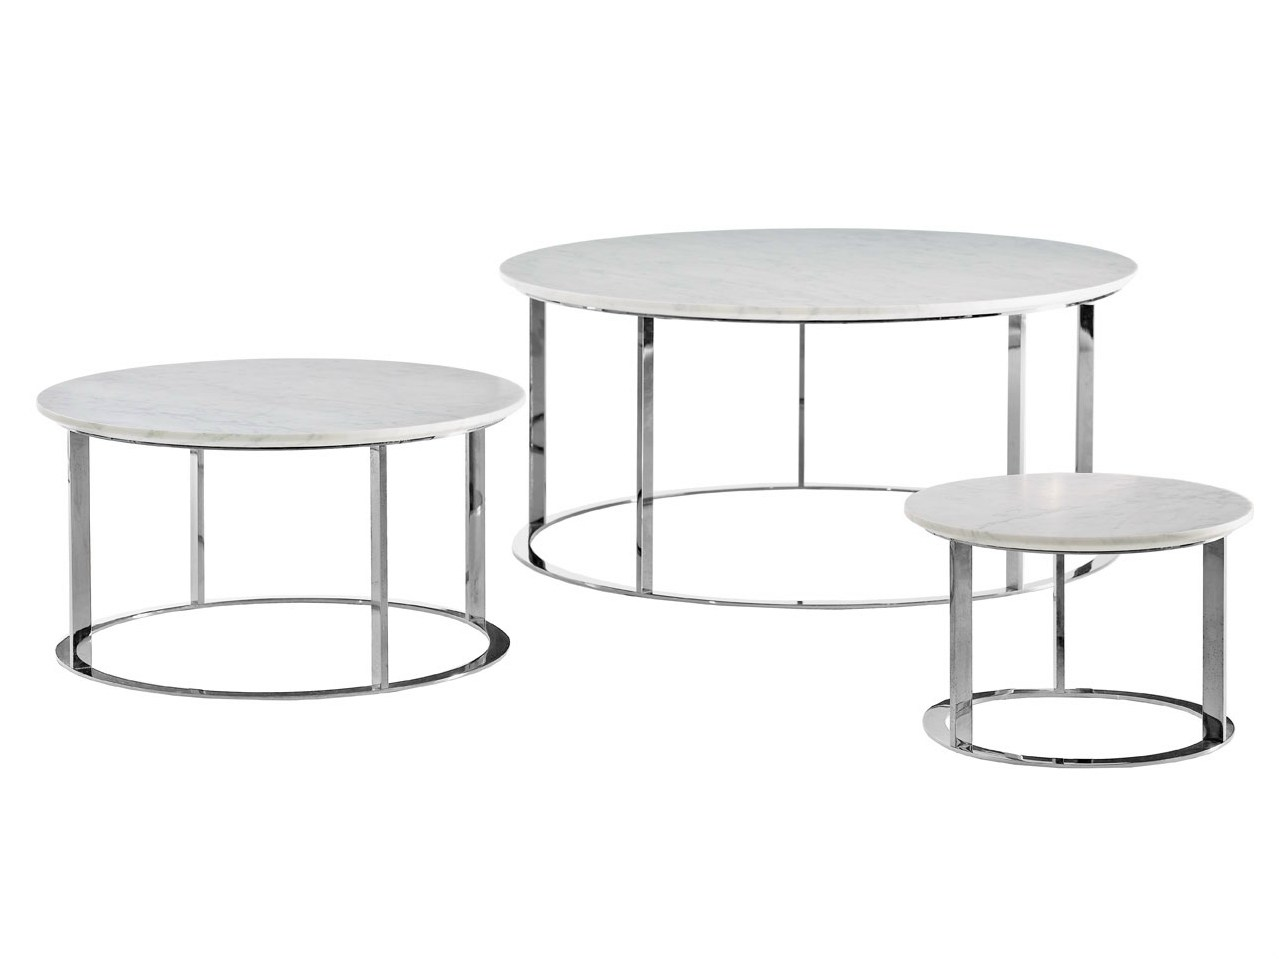 Round Marble Coffee Table Mera Mera Collection By B B Italia Design Antonio Citterio